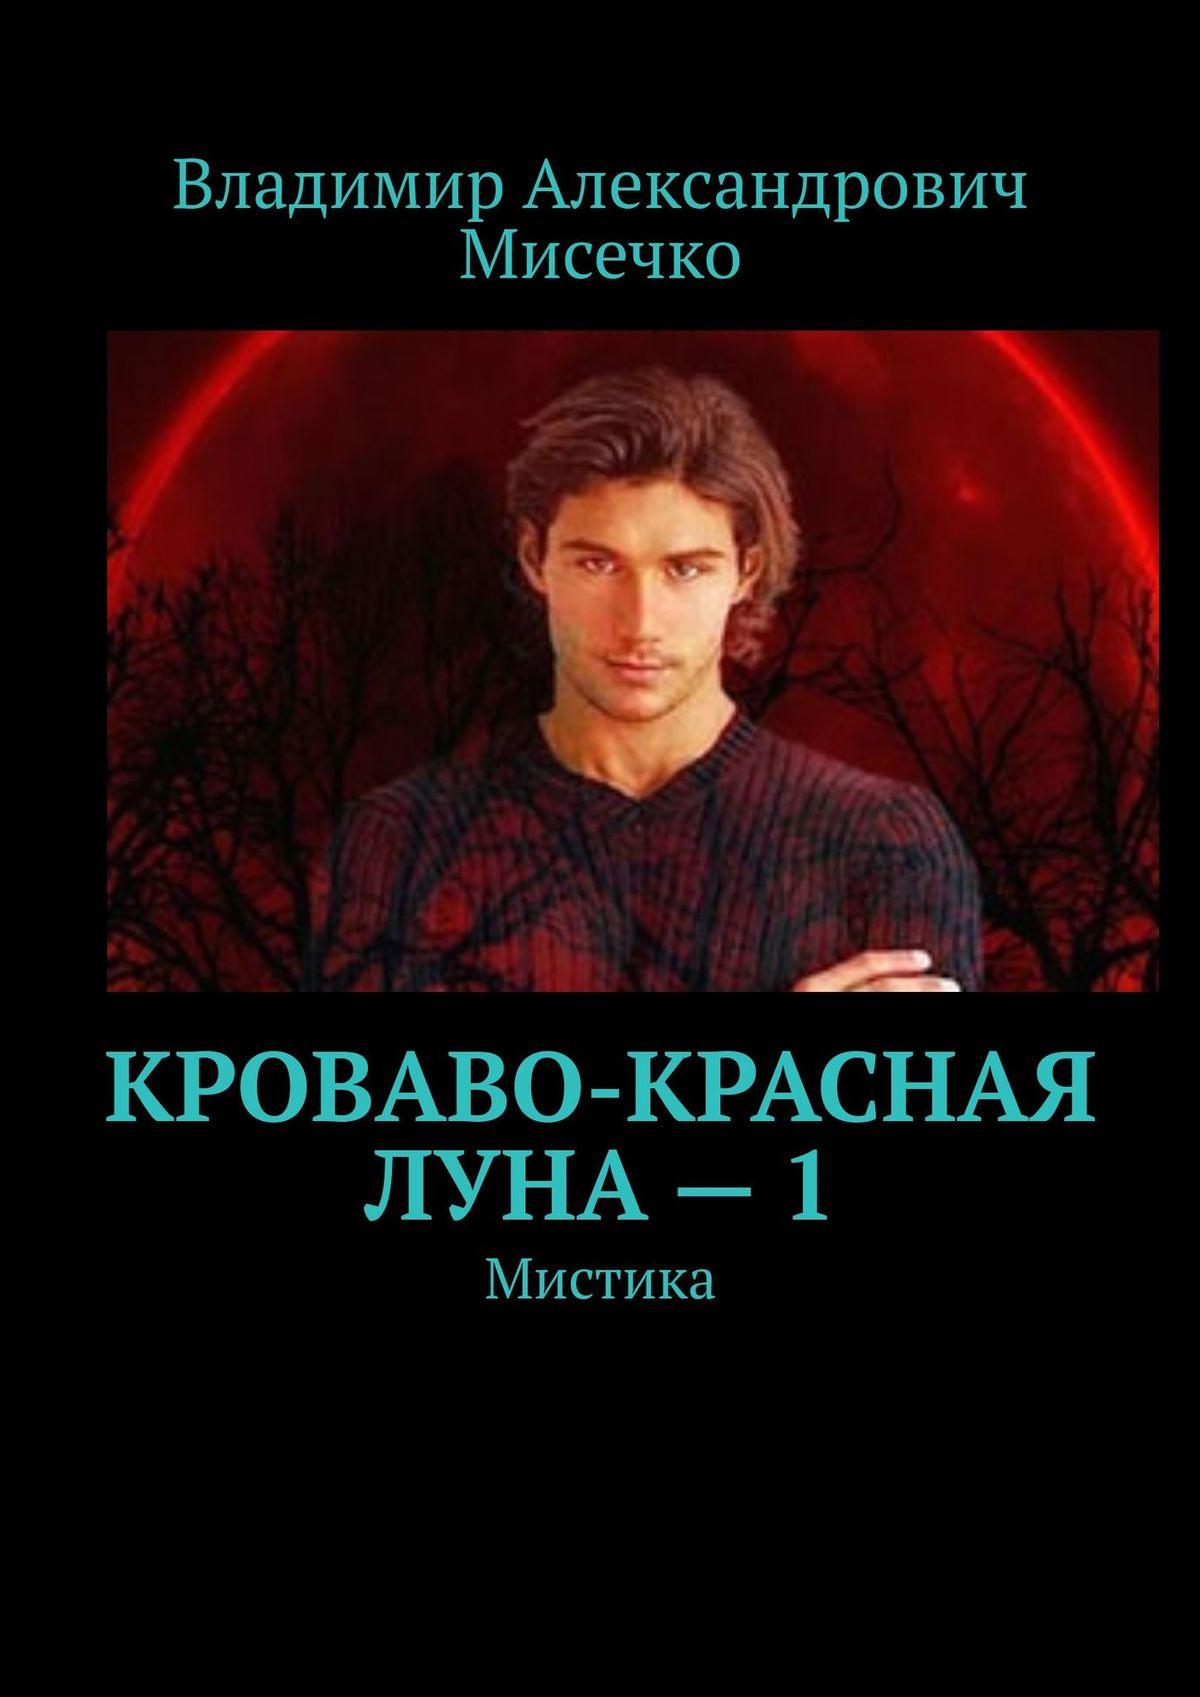 Кроваво-красная луна–1. Мистика